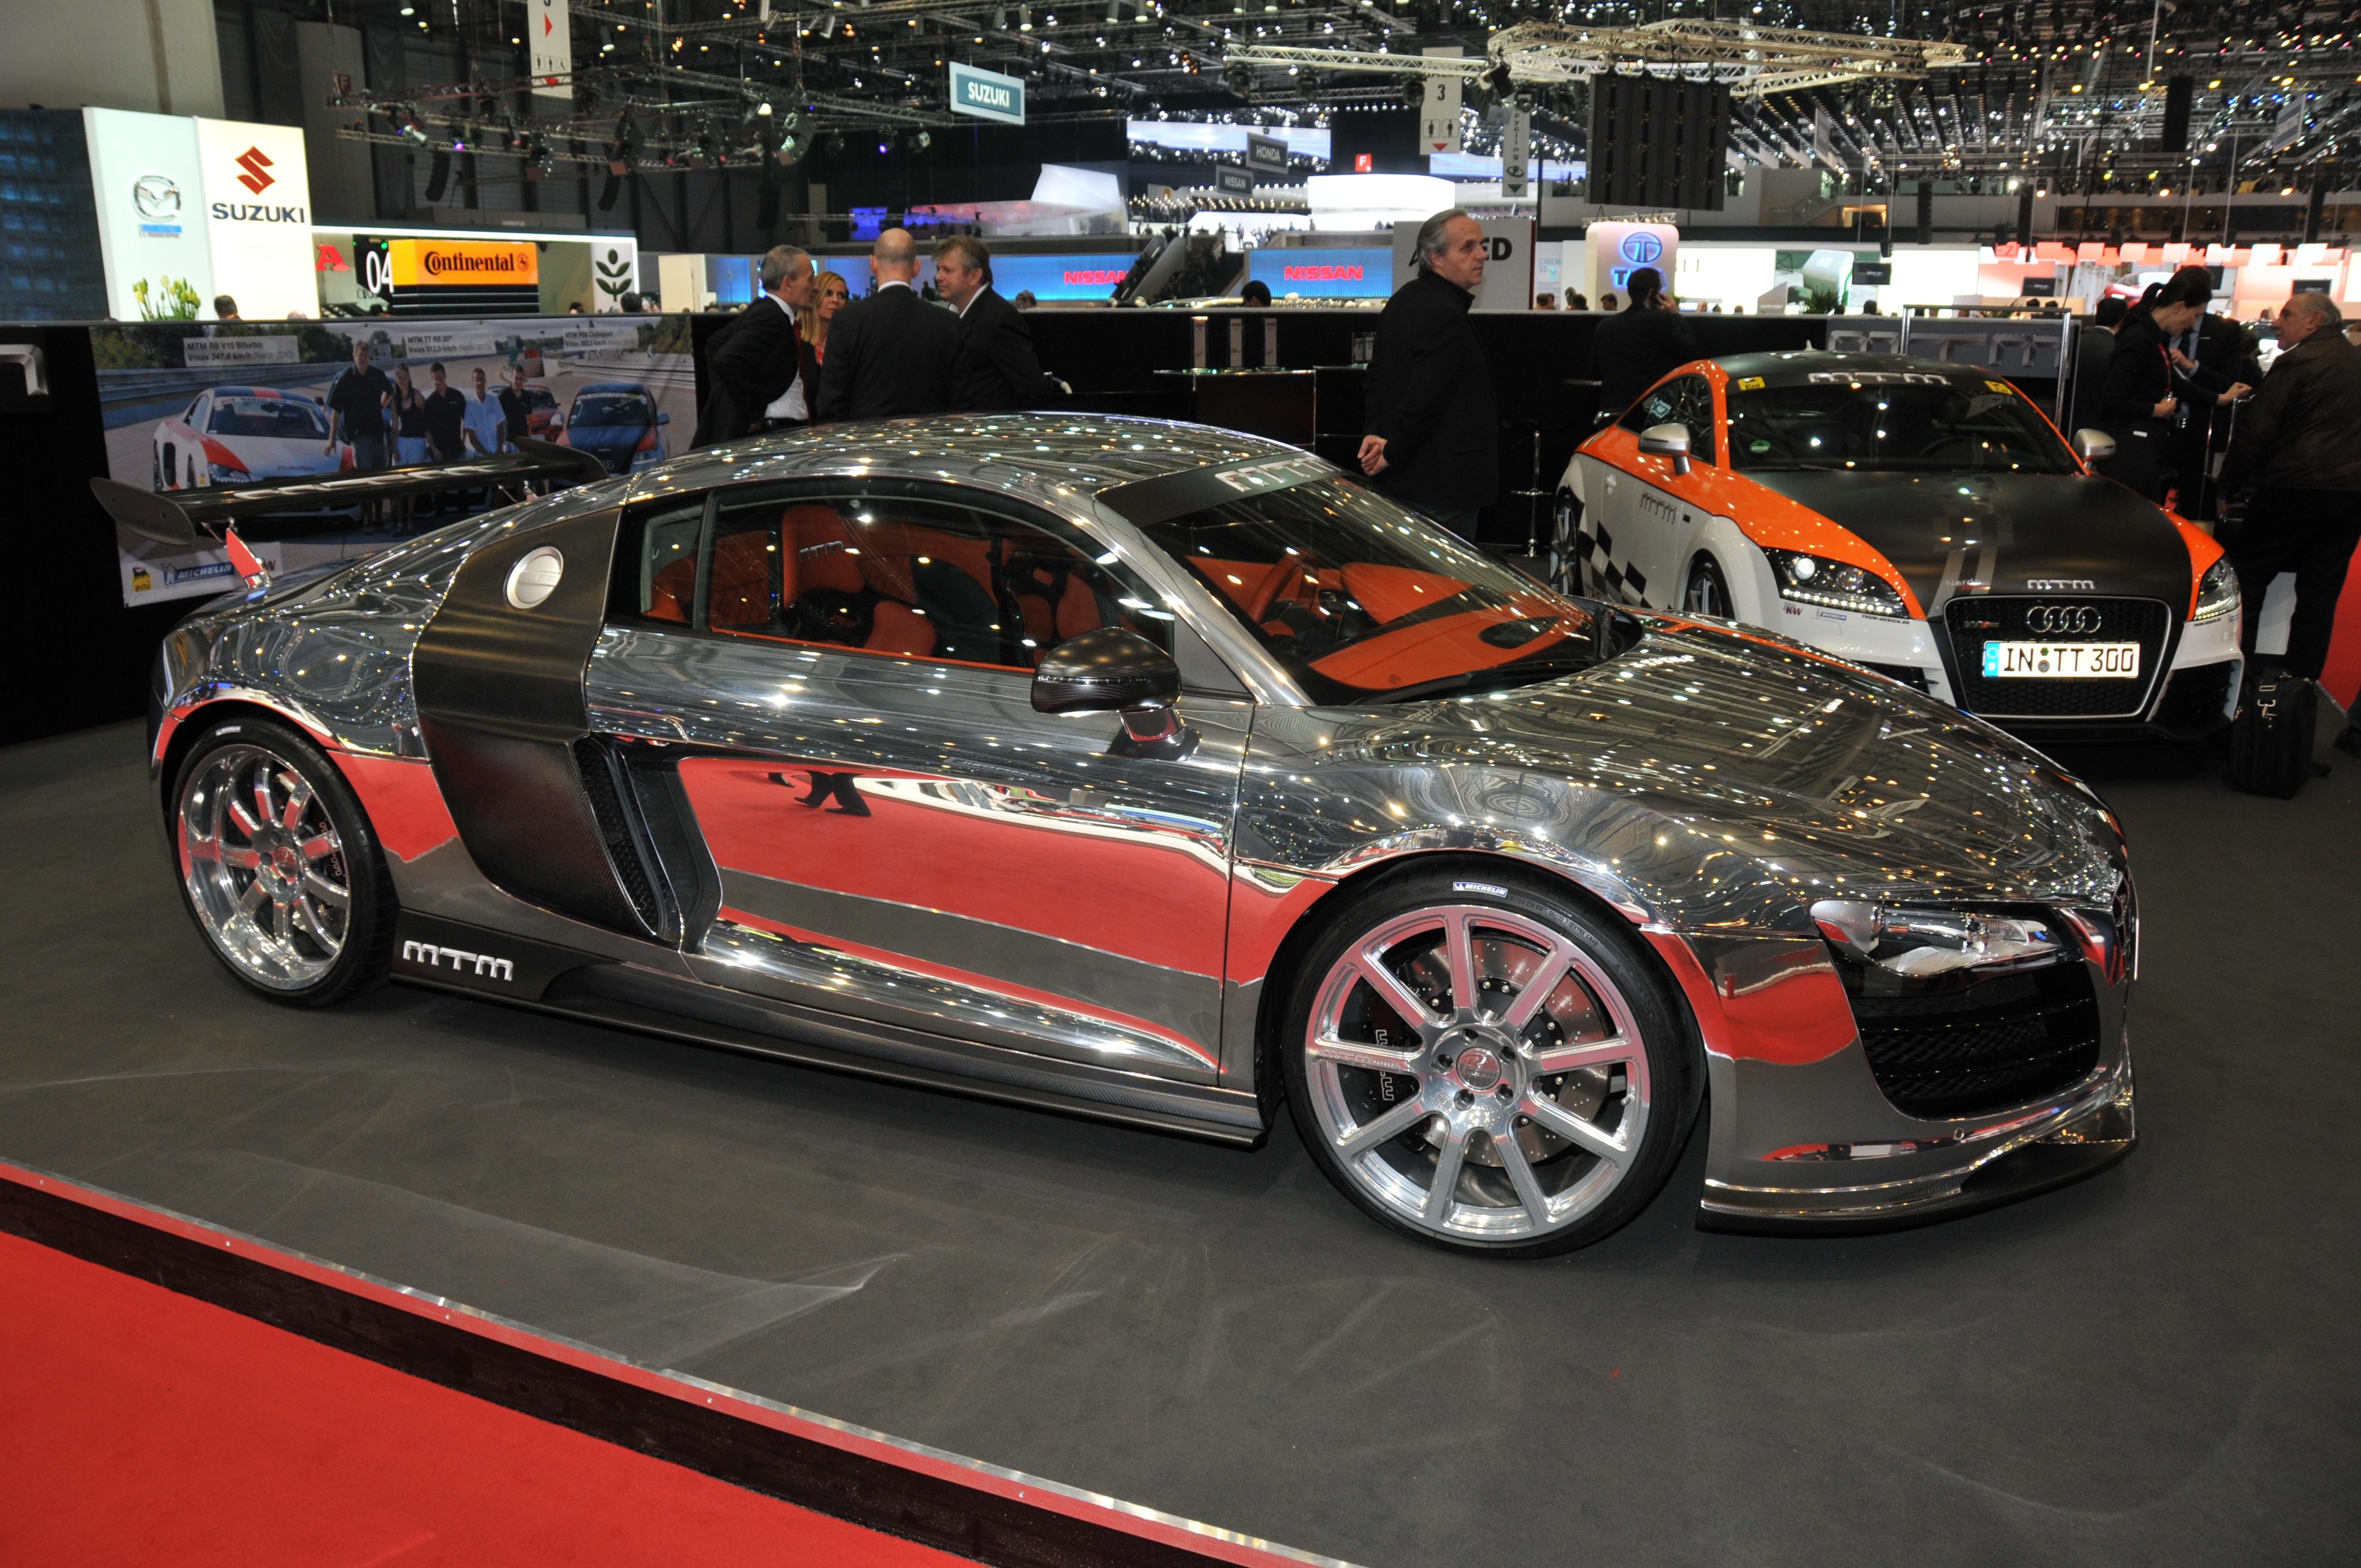 File:Audi R8 by MTM (5537036859).jpg - Wikimedia Commons